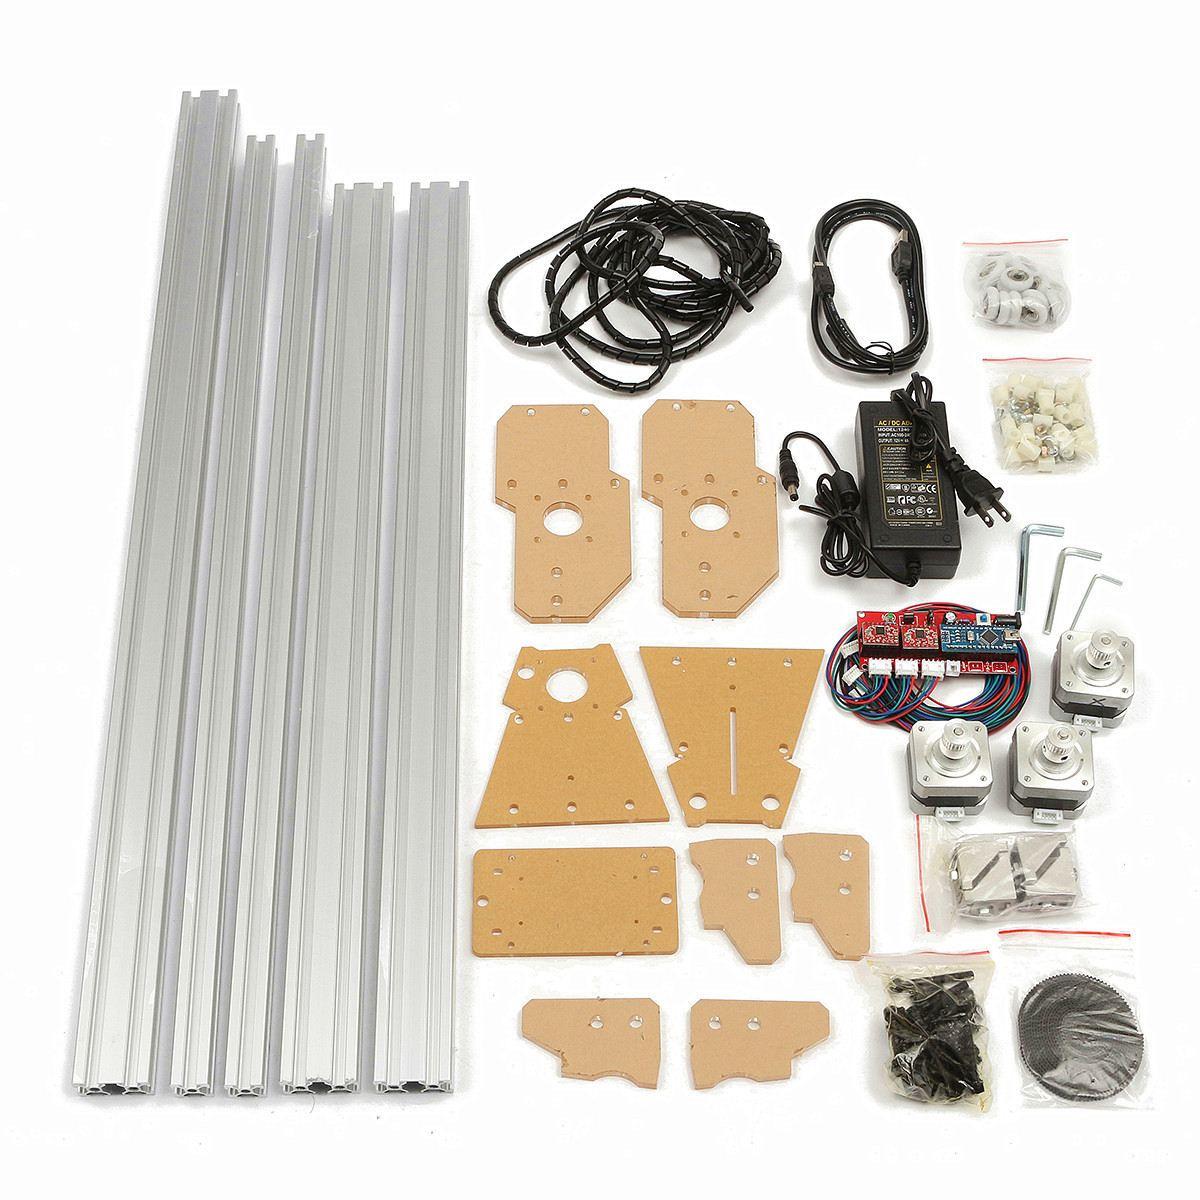 1Set 65x50cm 100 mw 5500 mw DIY Desktop Mini Lasersnijden/Graveren Graveur Machine DC 12V Hout Cutter/Printer/Power Verstelbare - 2